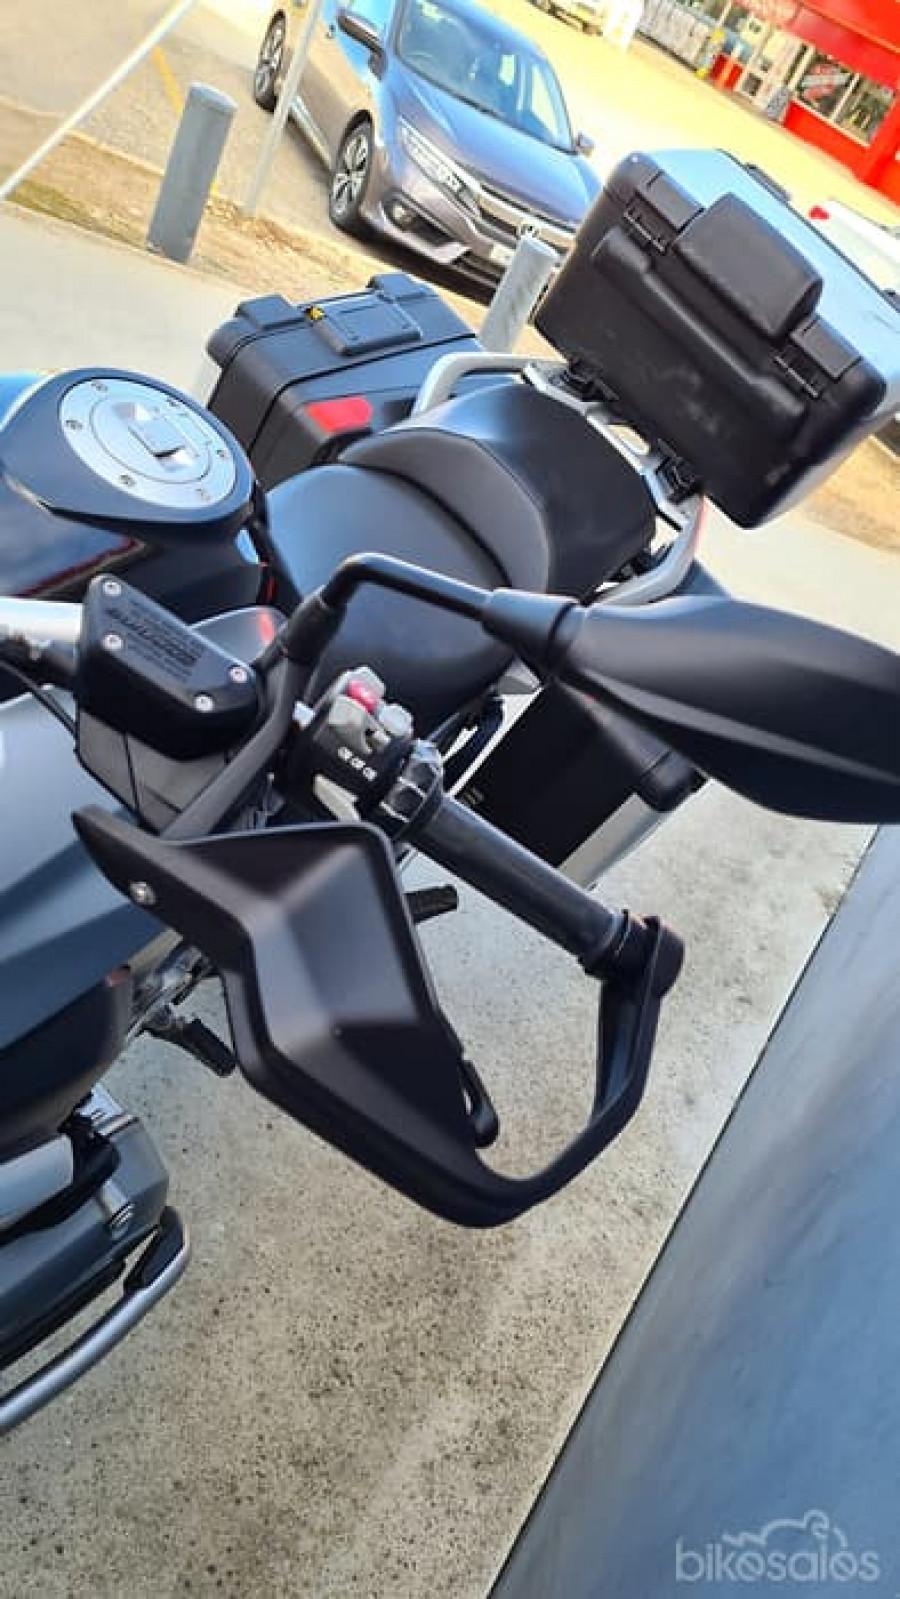 2014 BMW R 1200 GS  R Dual Purpose Motorcycle Image 20